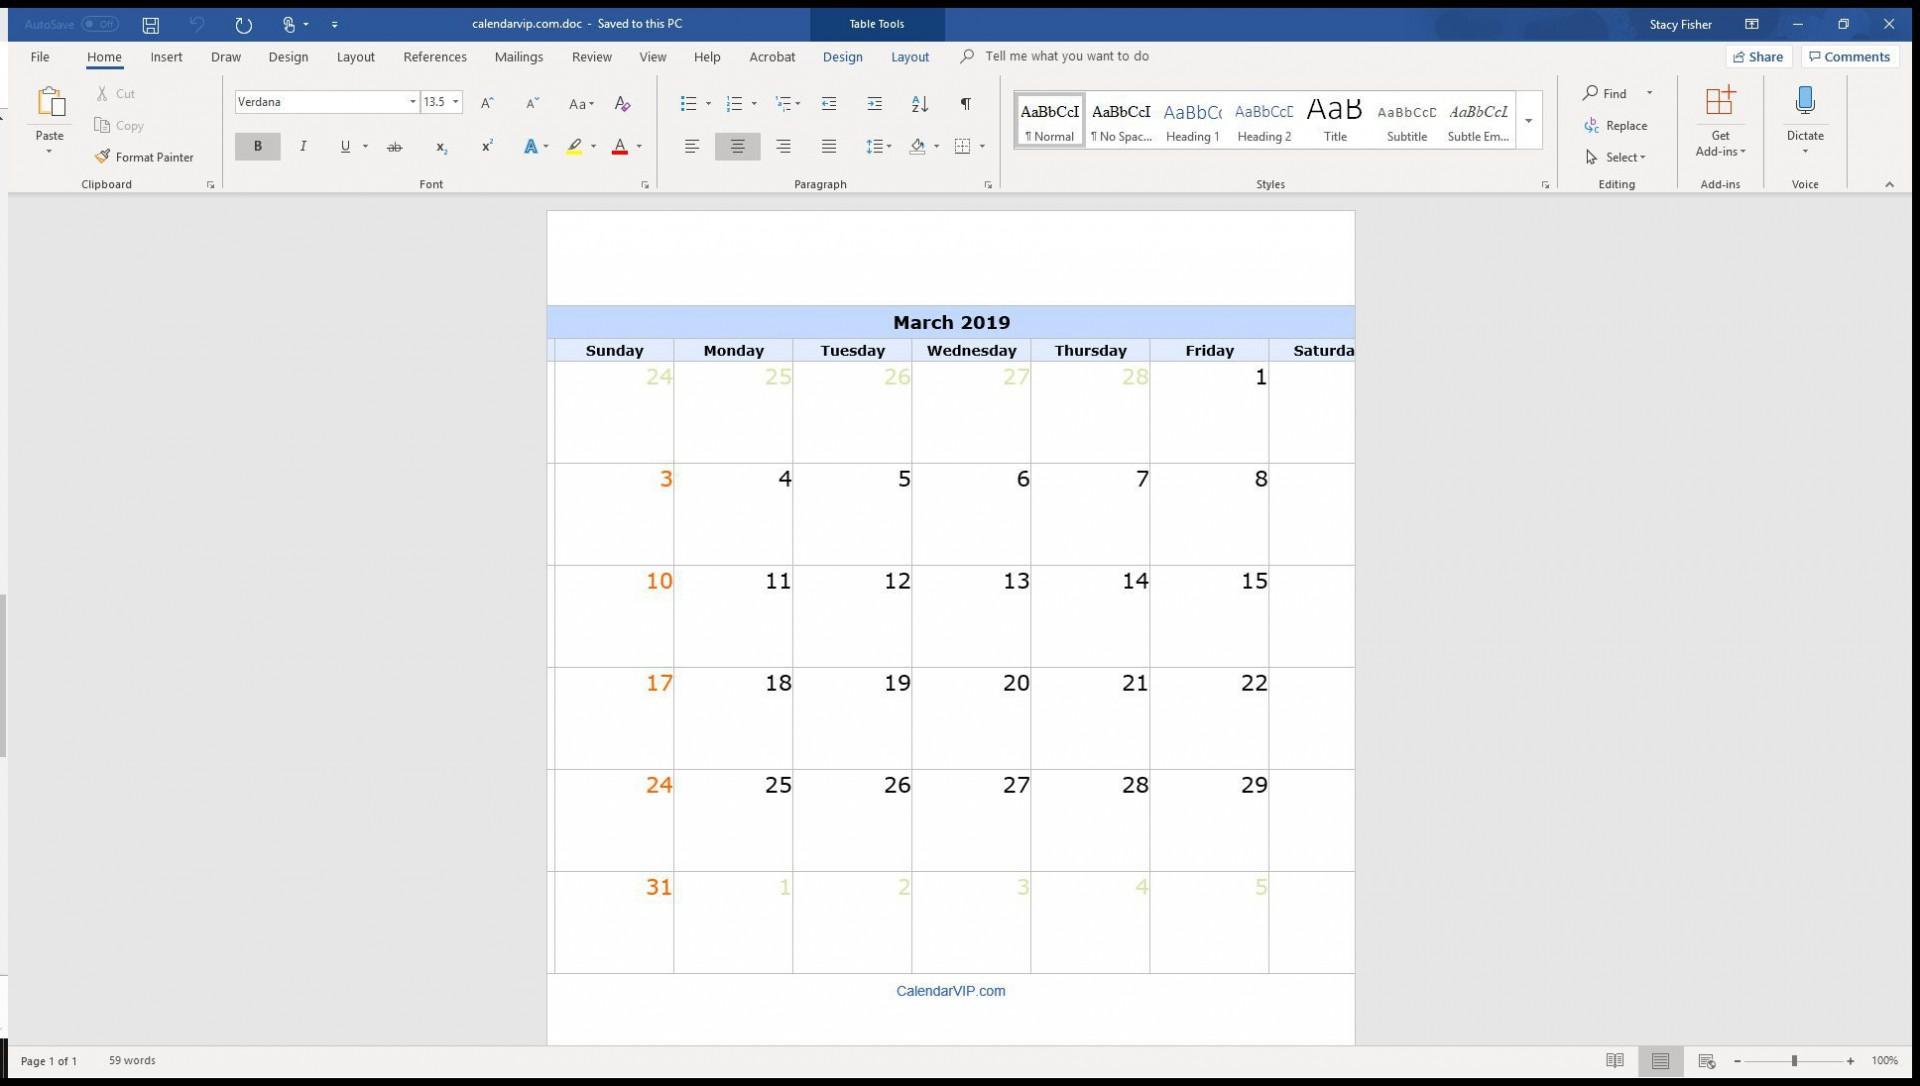 002 Impressive Download Calendar Template For Word 2007 Concept 1920